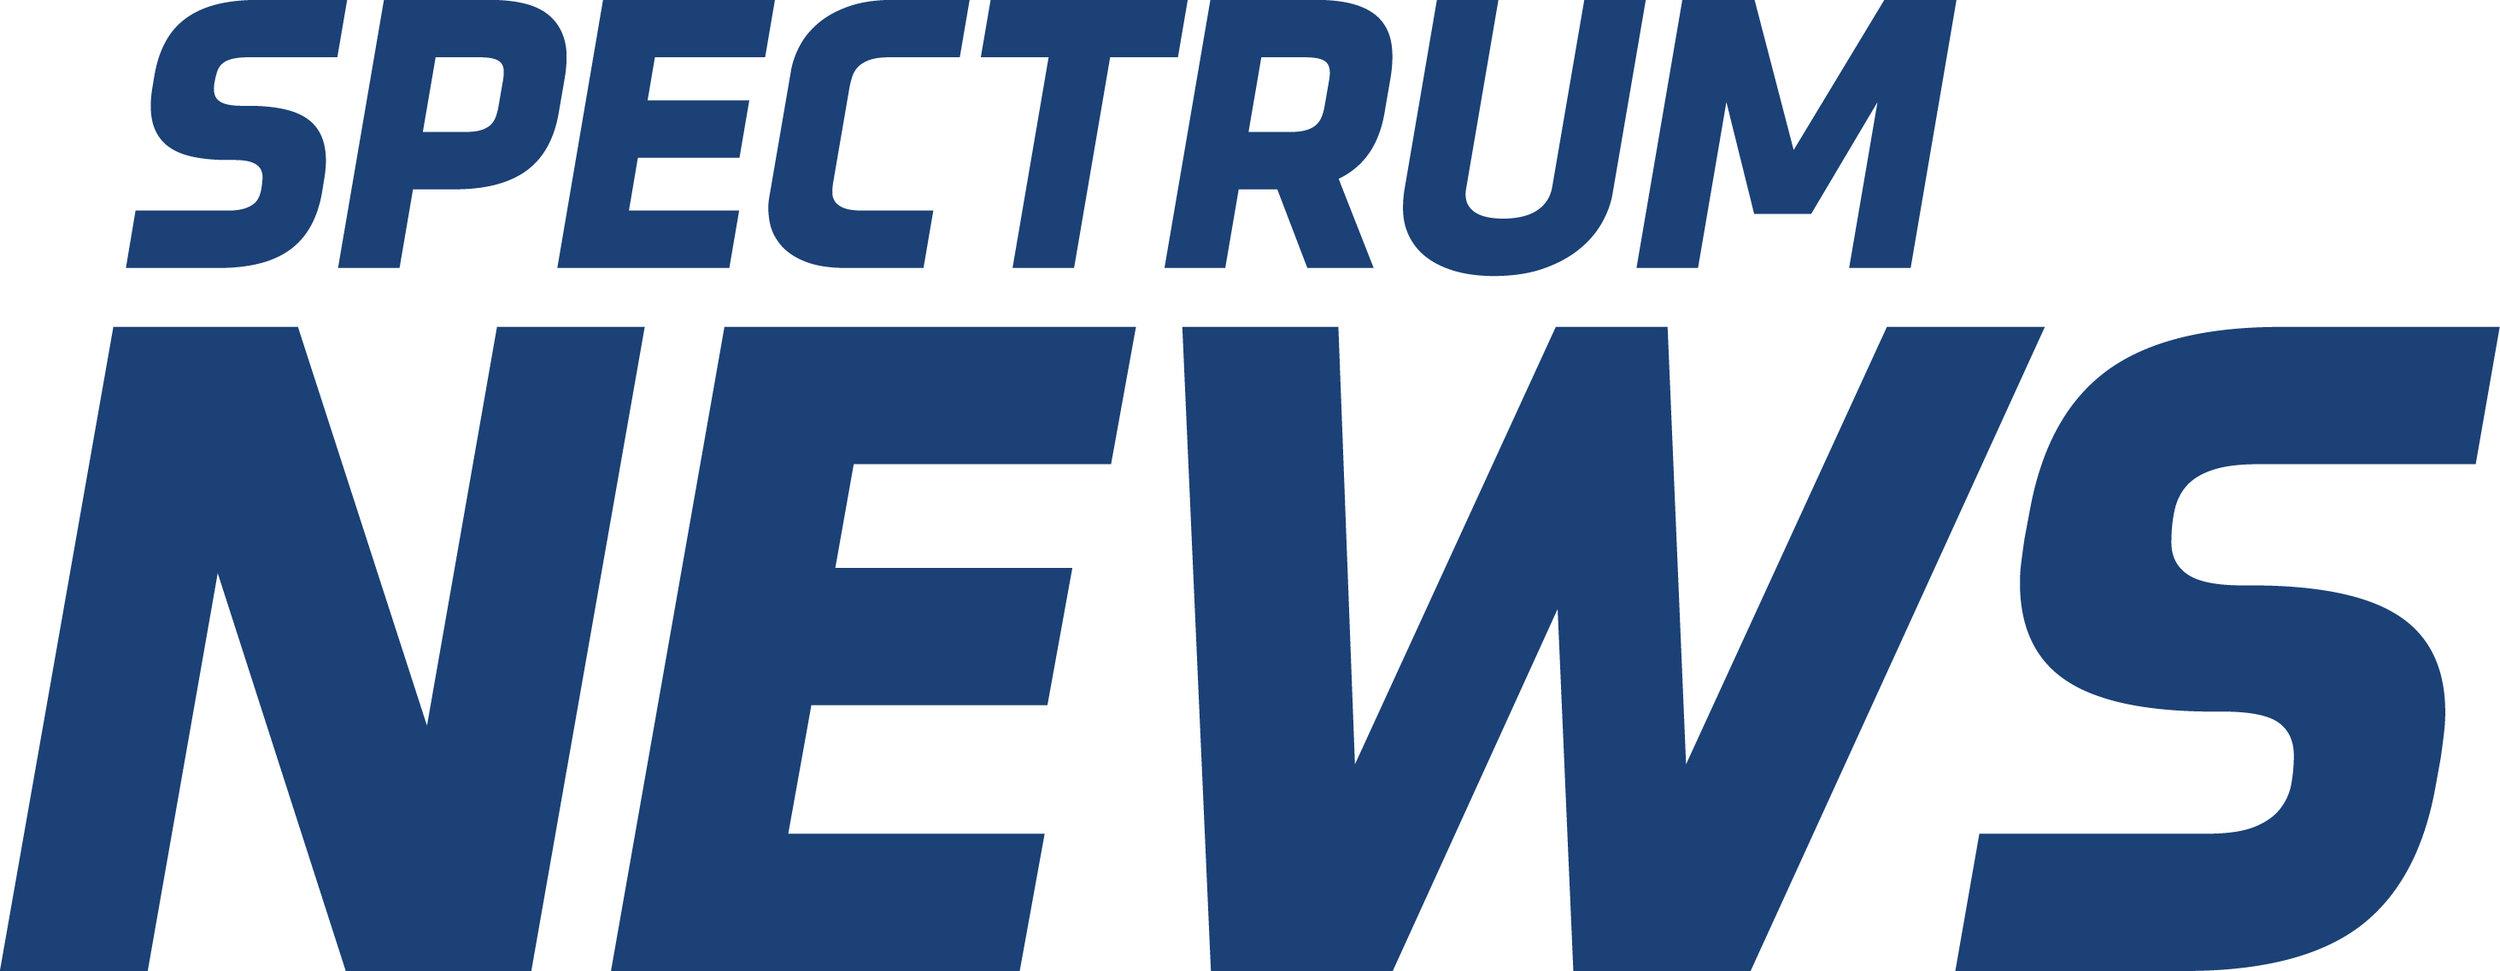 SPECTRUM_LOGO_NEWS_RGB_FLAT_BLUE_OW.jpg